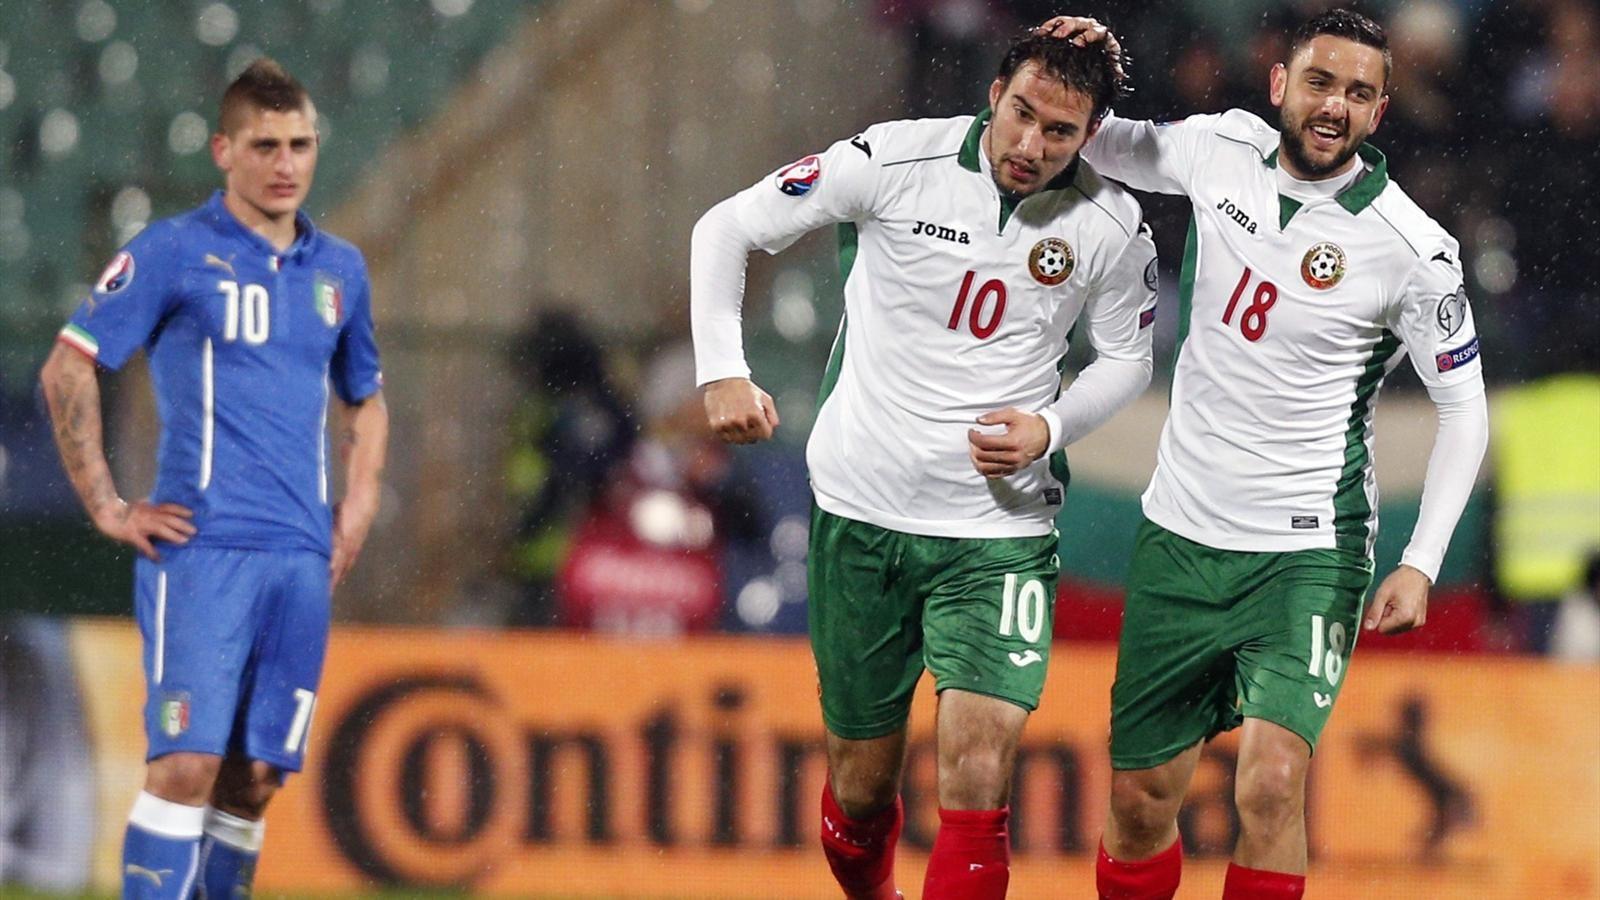 Италия — Болгария: 06-09-2015